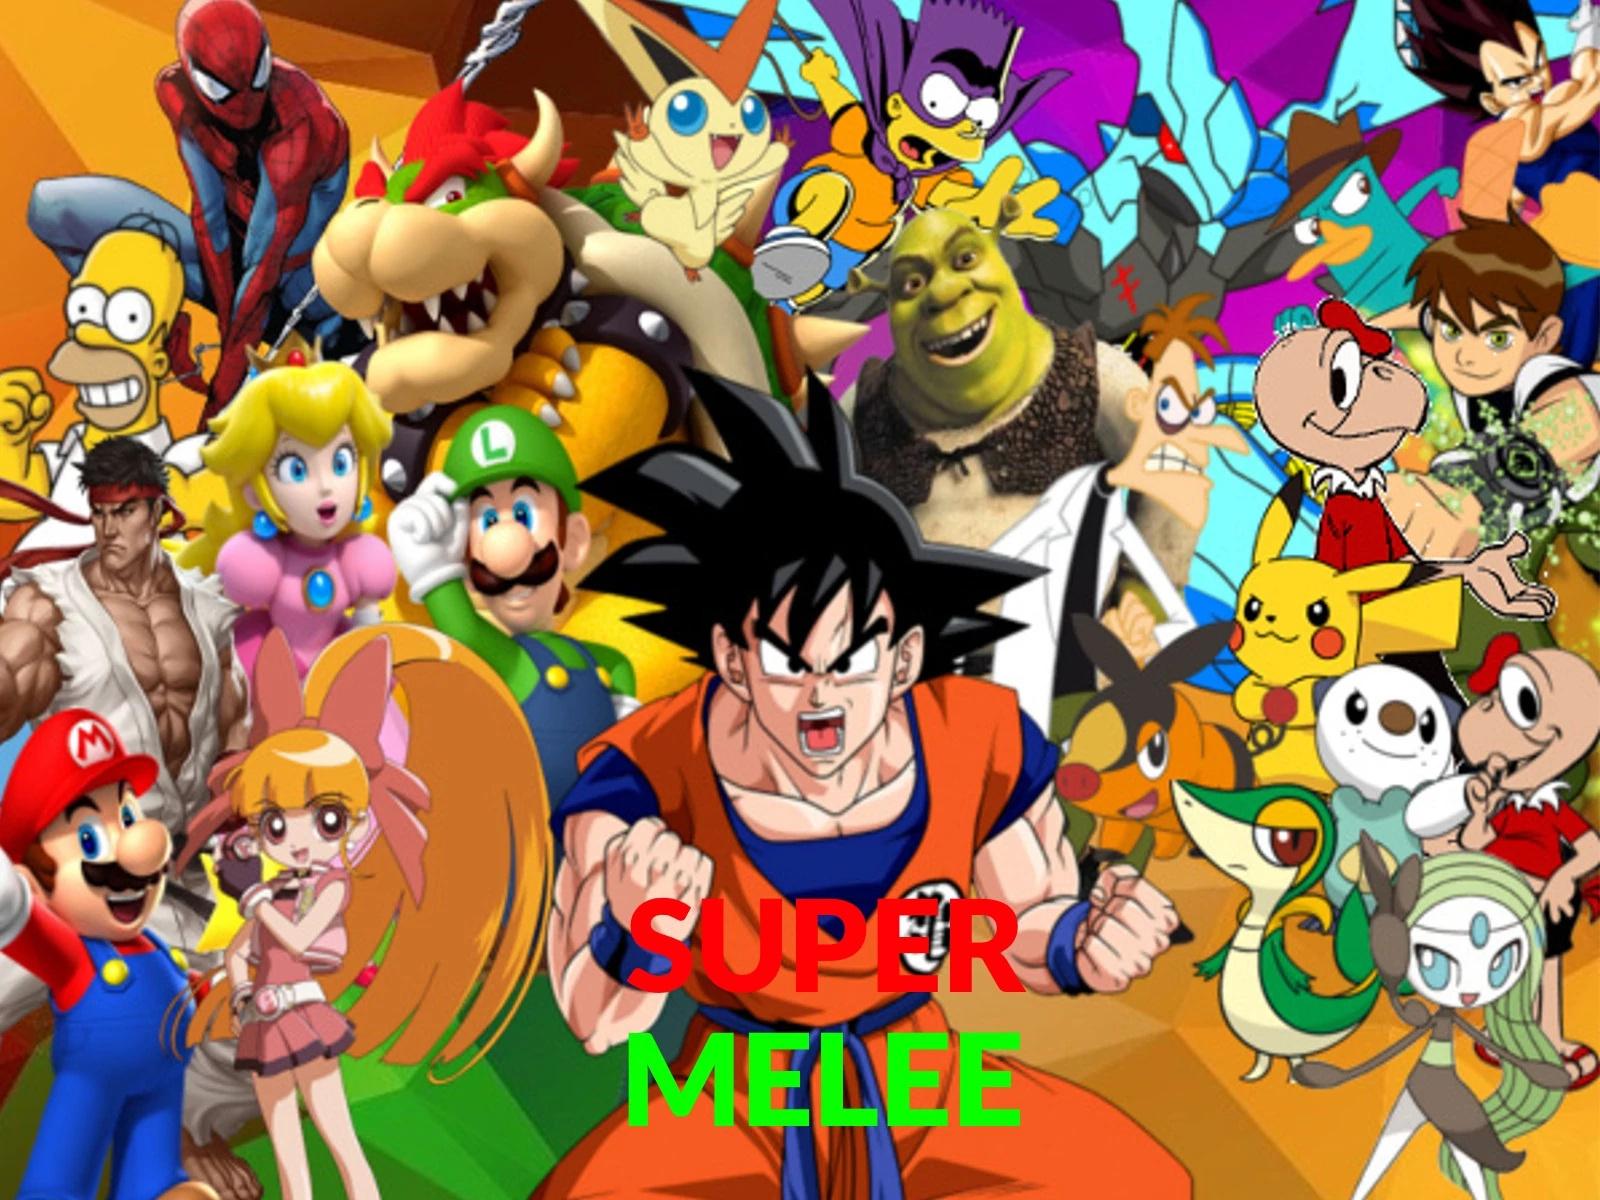 Category:Crossover | Cartoon Network Fanon Wiki | Fandom